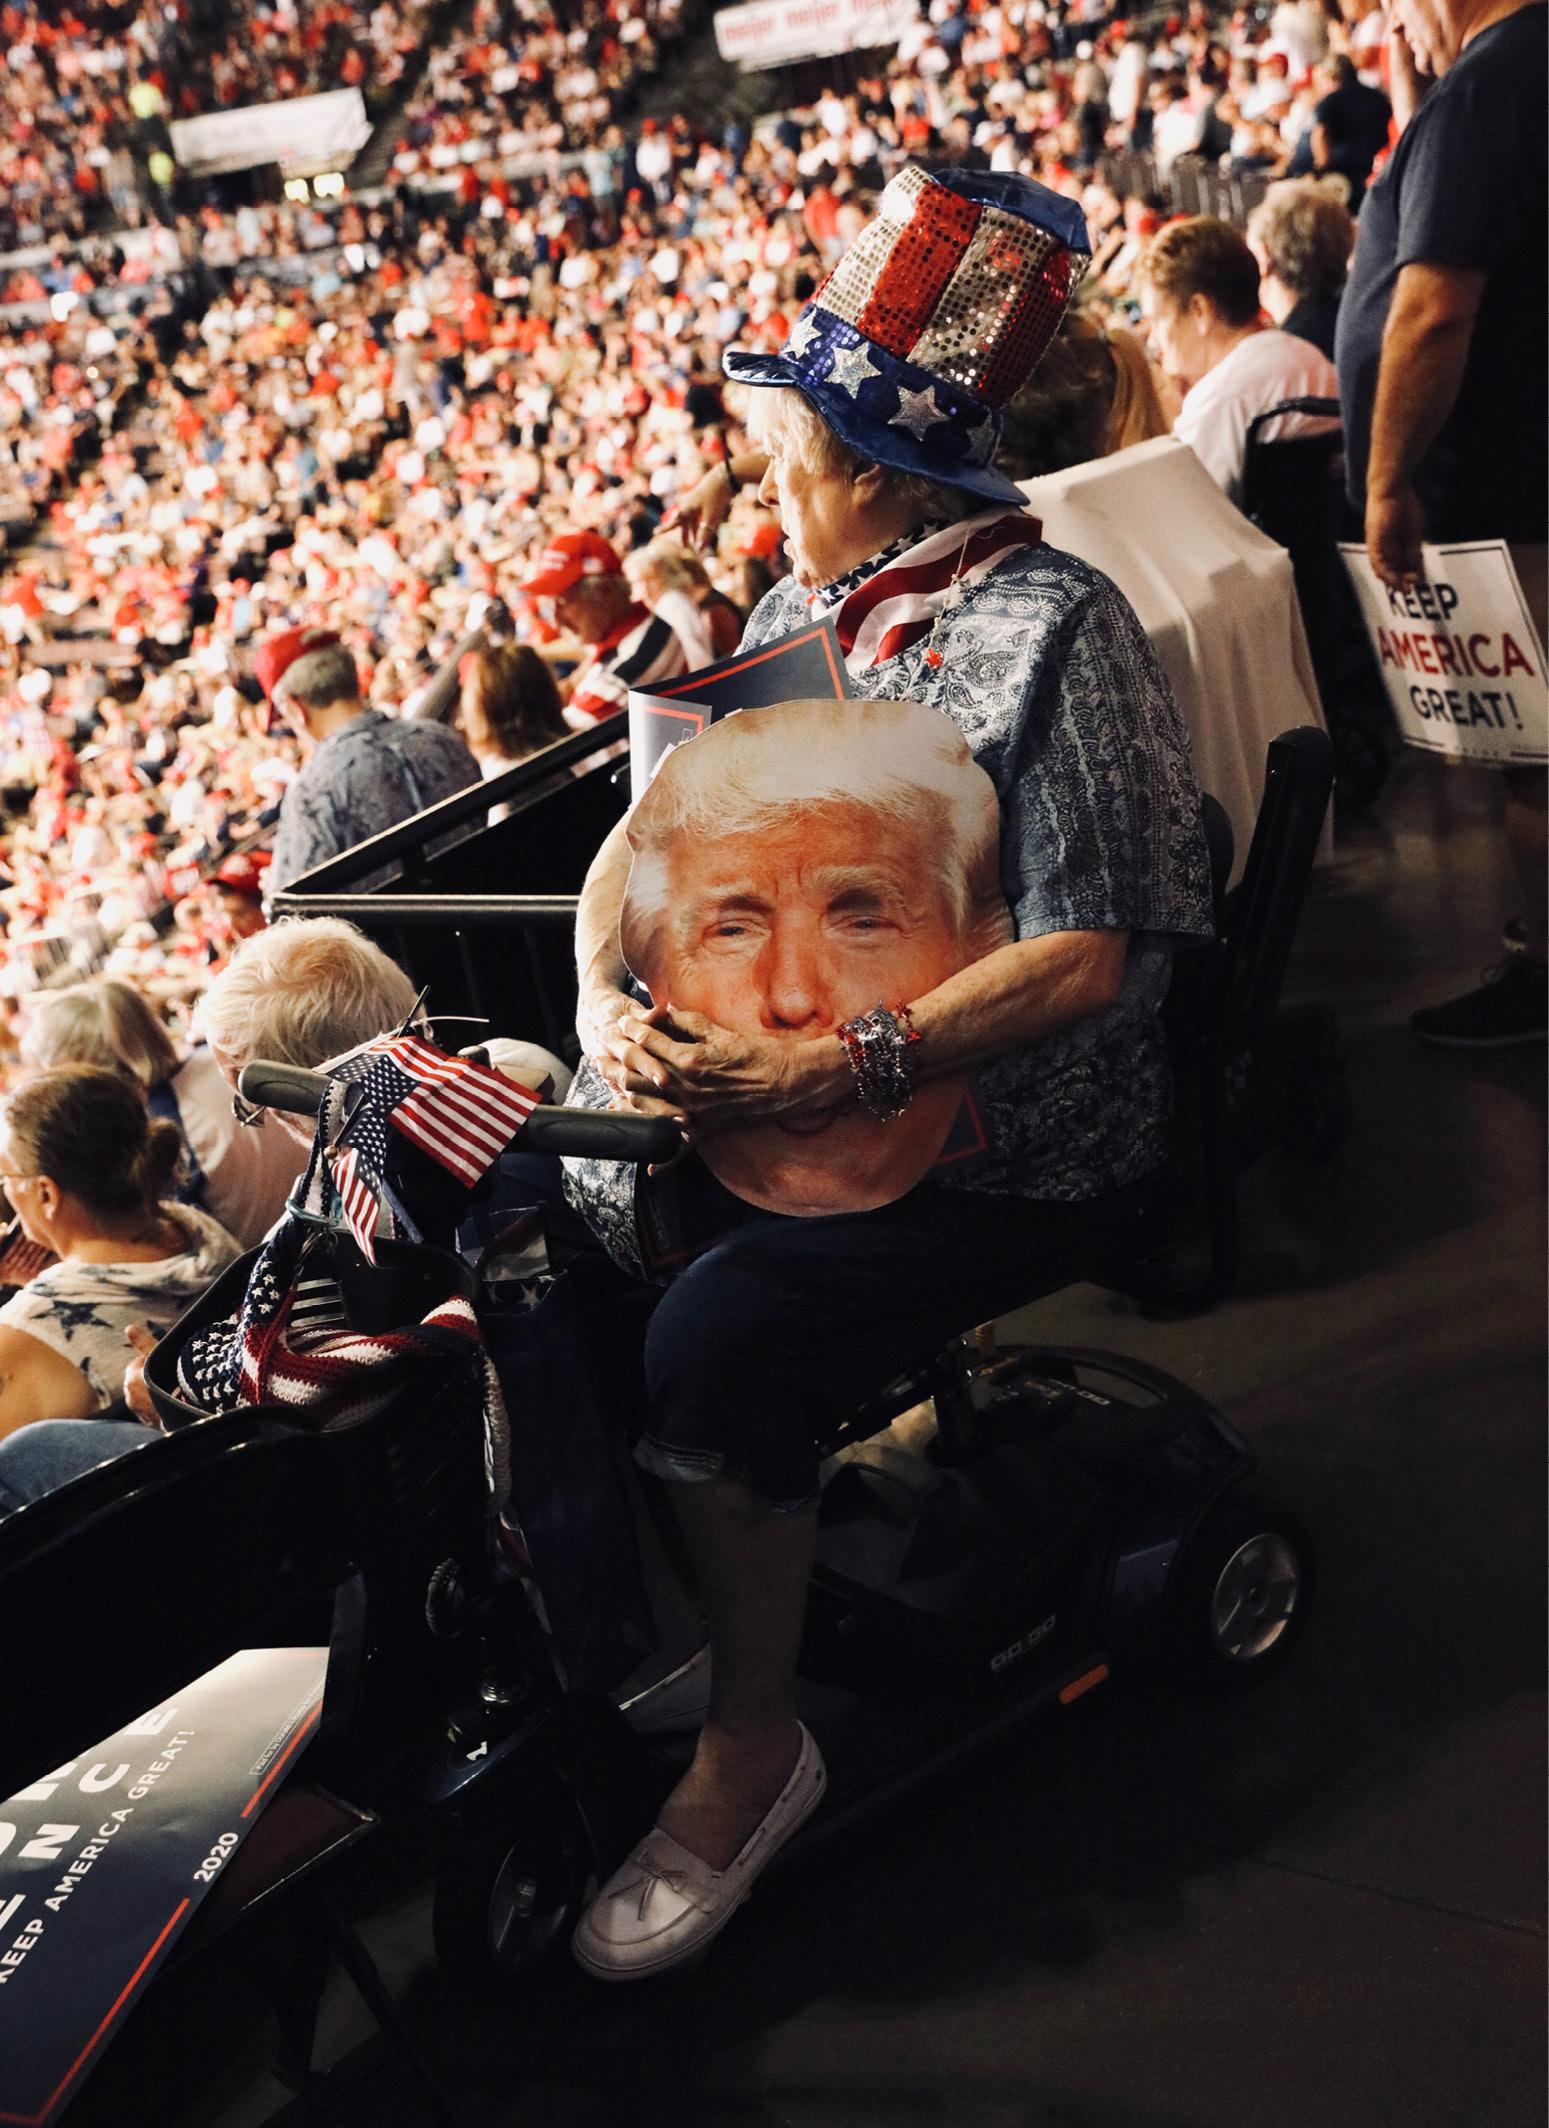 Andy Grant Trump Rally 8.1.19 - II8.jpg